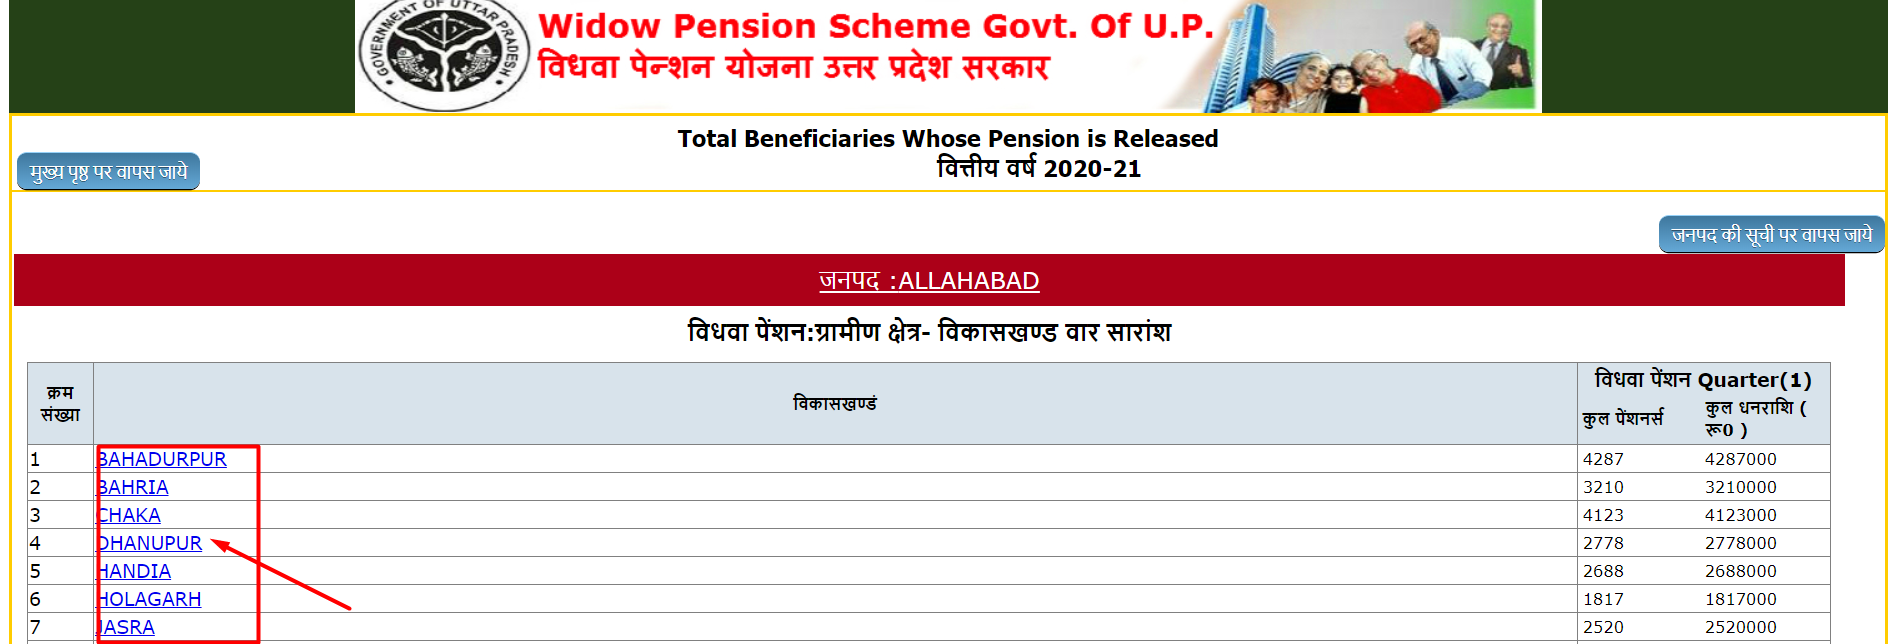 vidhwa pension